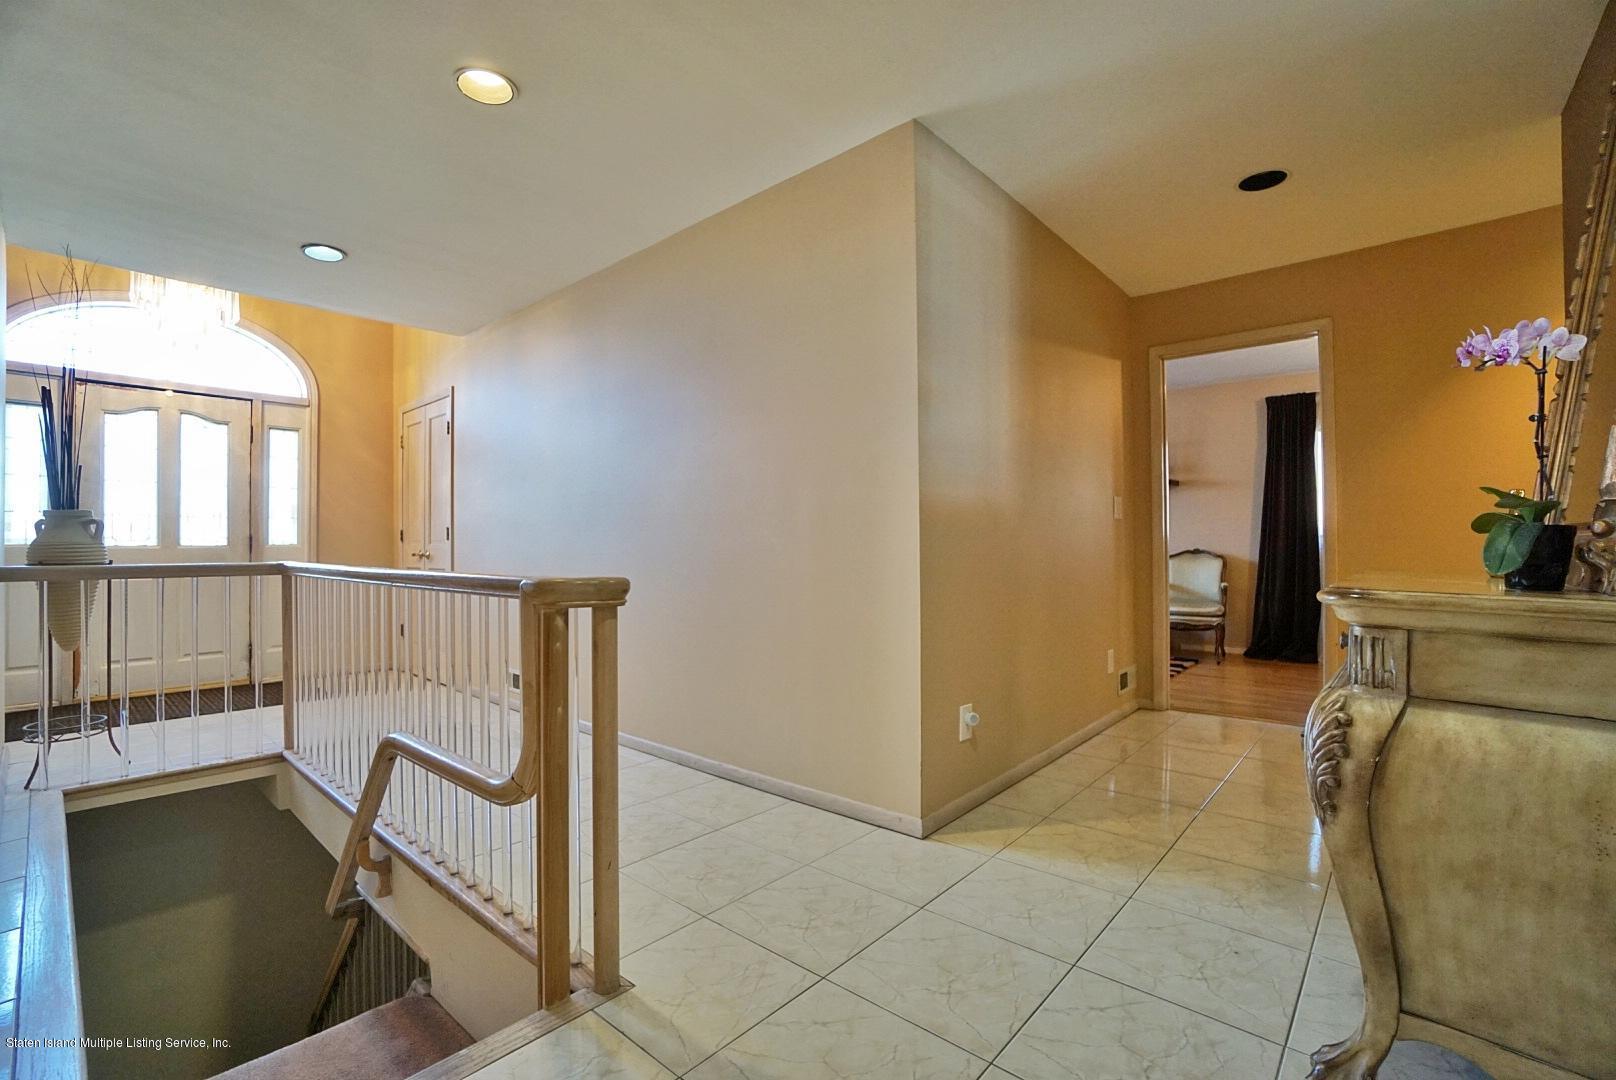 Single Family - Detached 183 Kensington Avenue  Staten Island, NY 10305, MLS-1127107-30